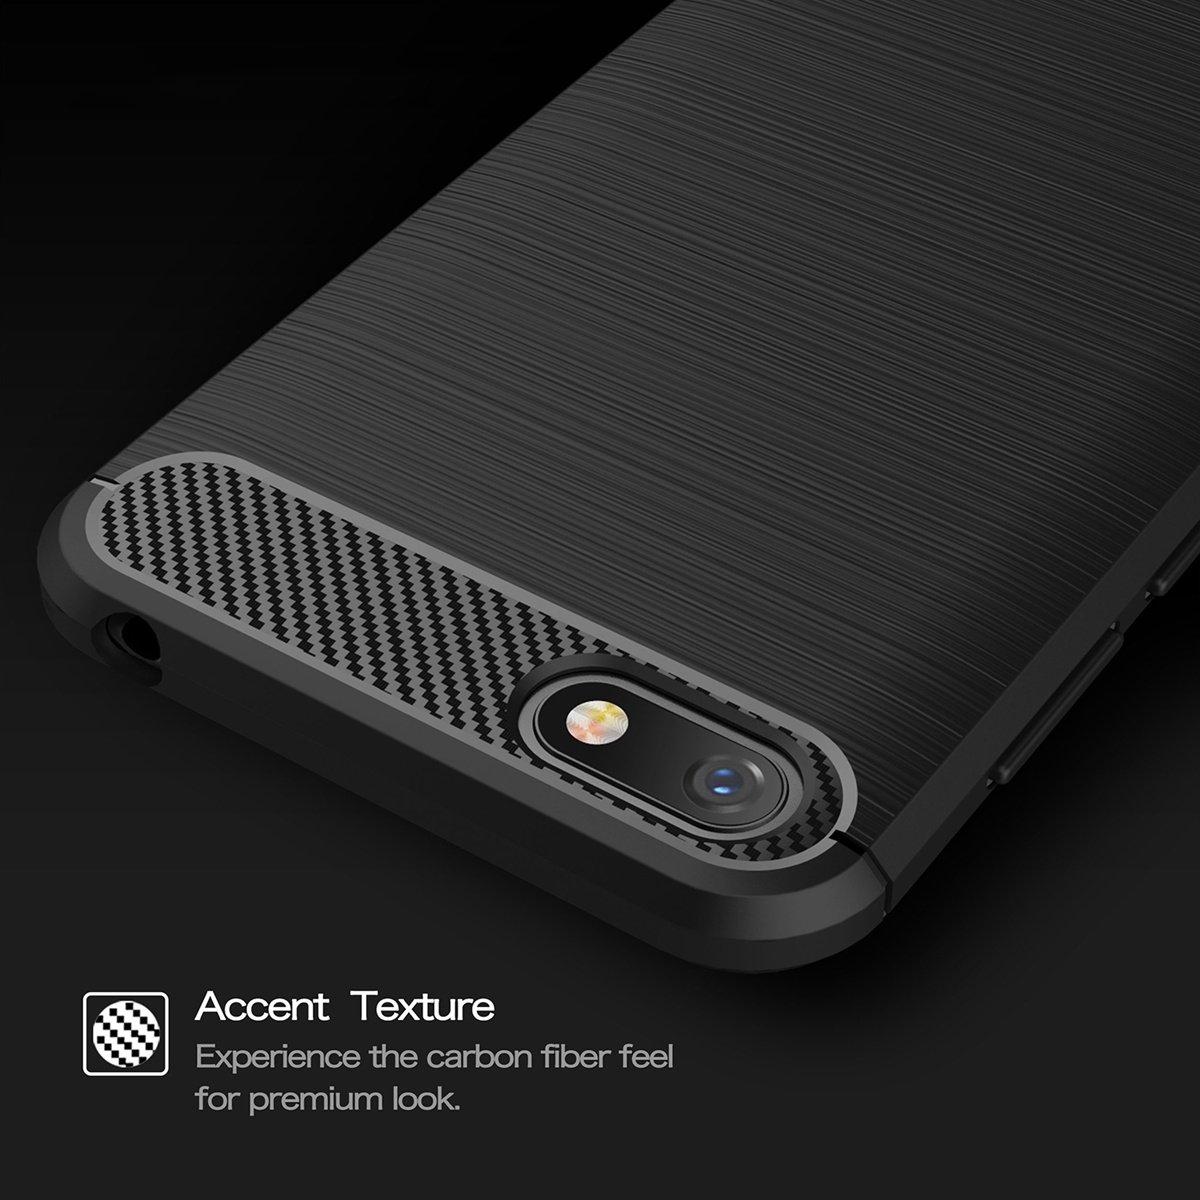 Amazon.com: Funda para Huawei Y5 Prime 2018, Yoodi Slim de ...